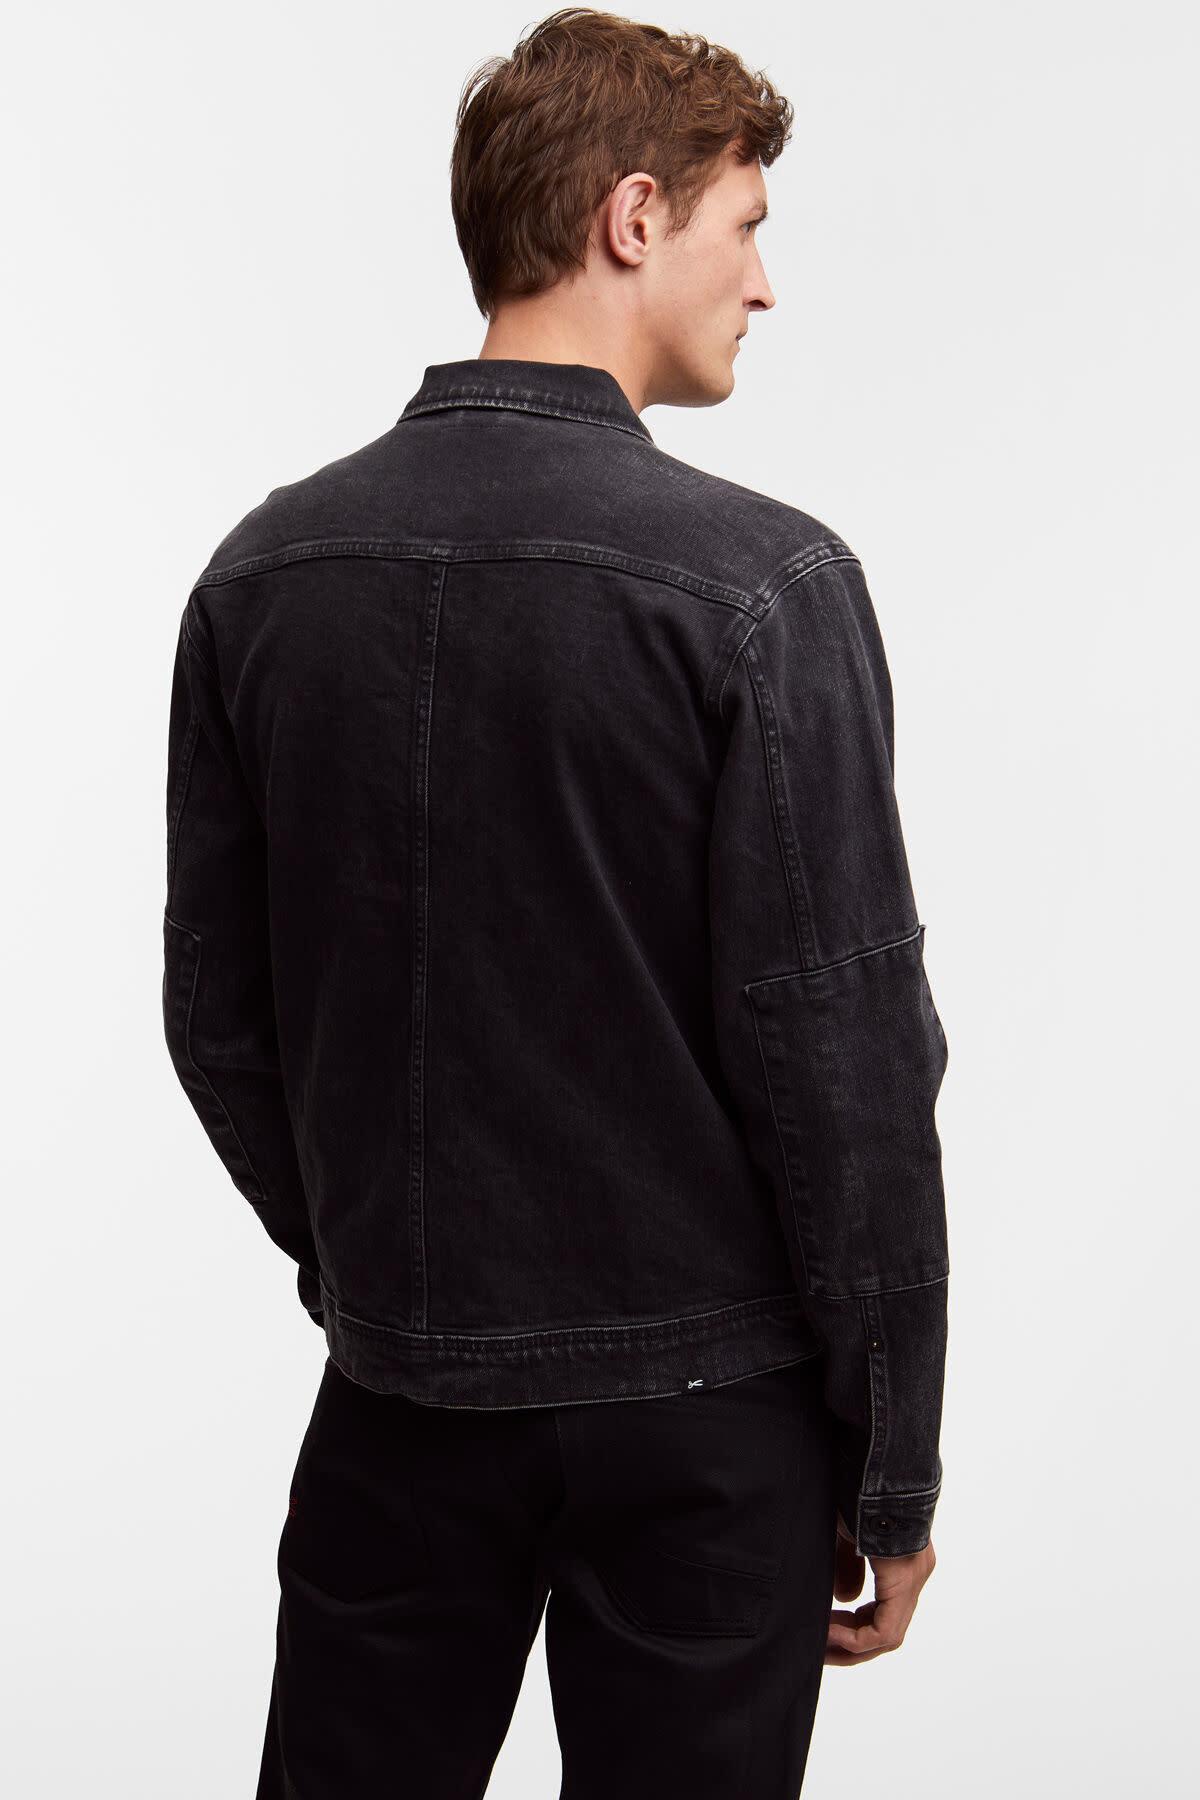 Winston denim jacket-4